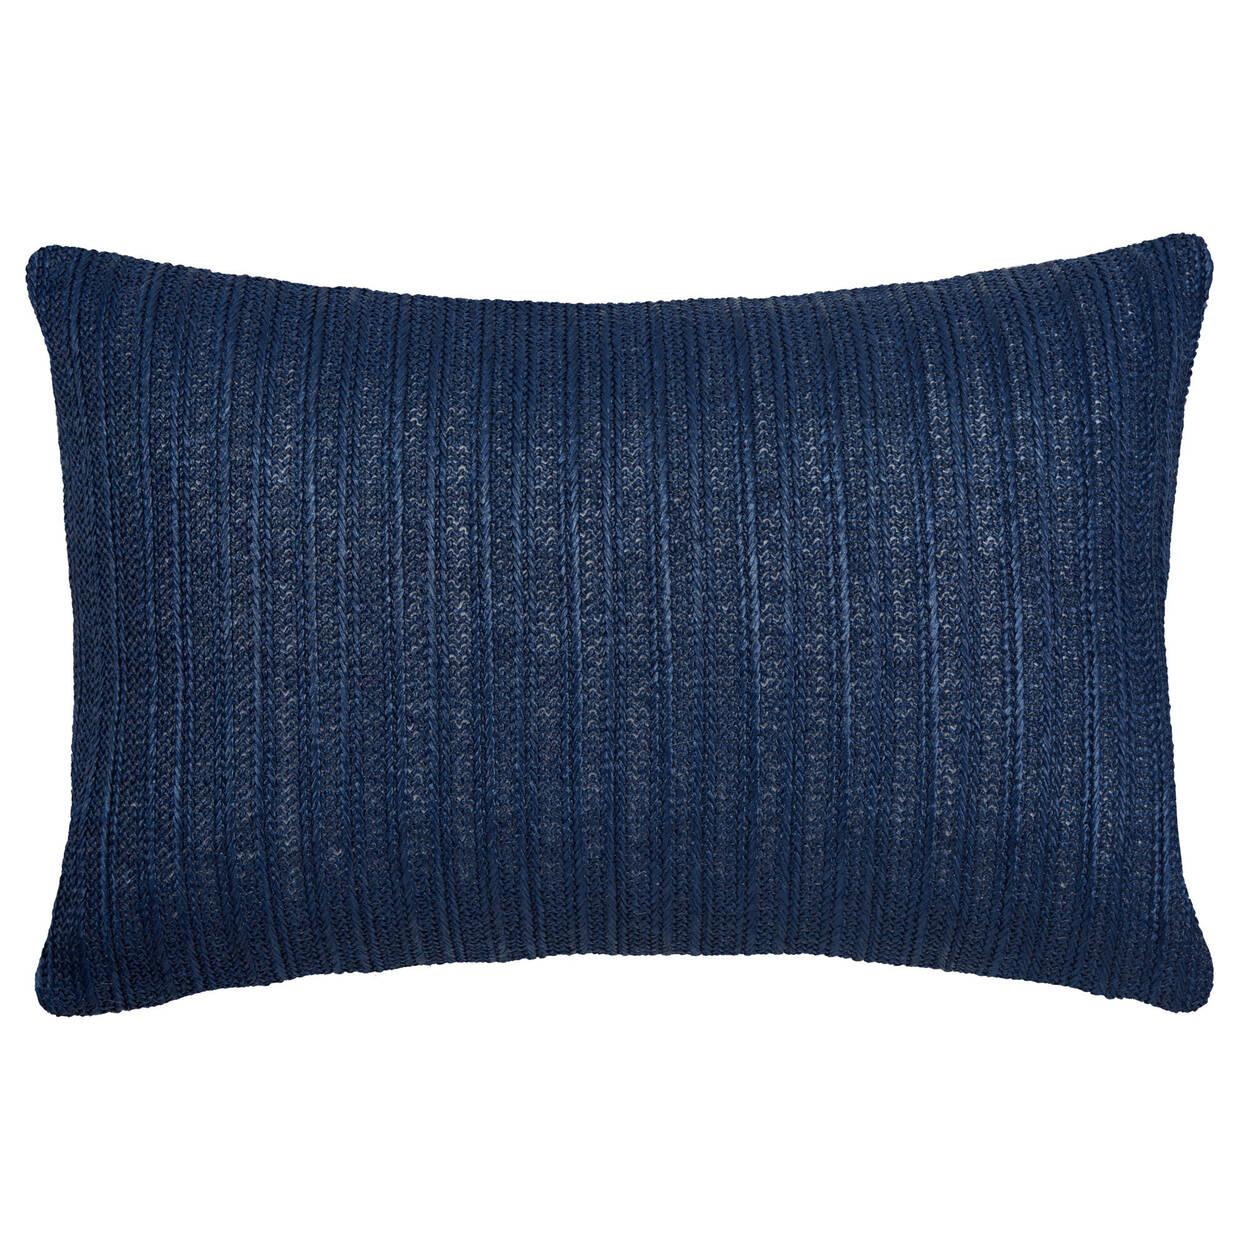 "Summer Paradise Water-Repellent Decorative Lumbar Pillow 13"" X 20"""